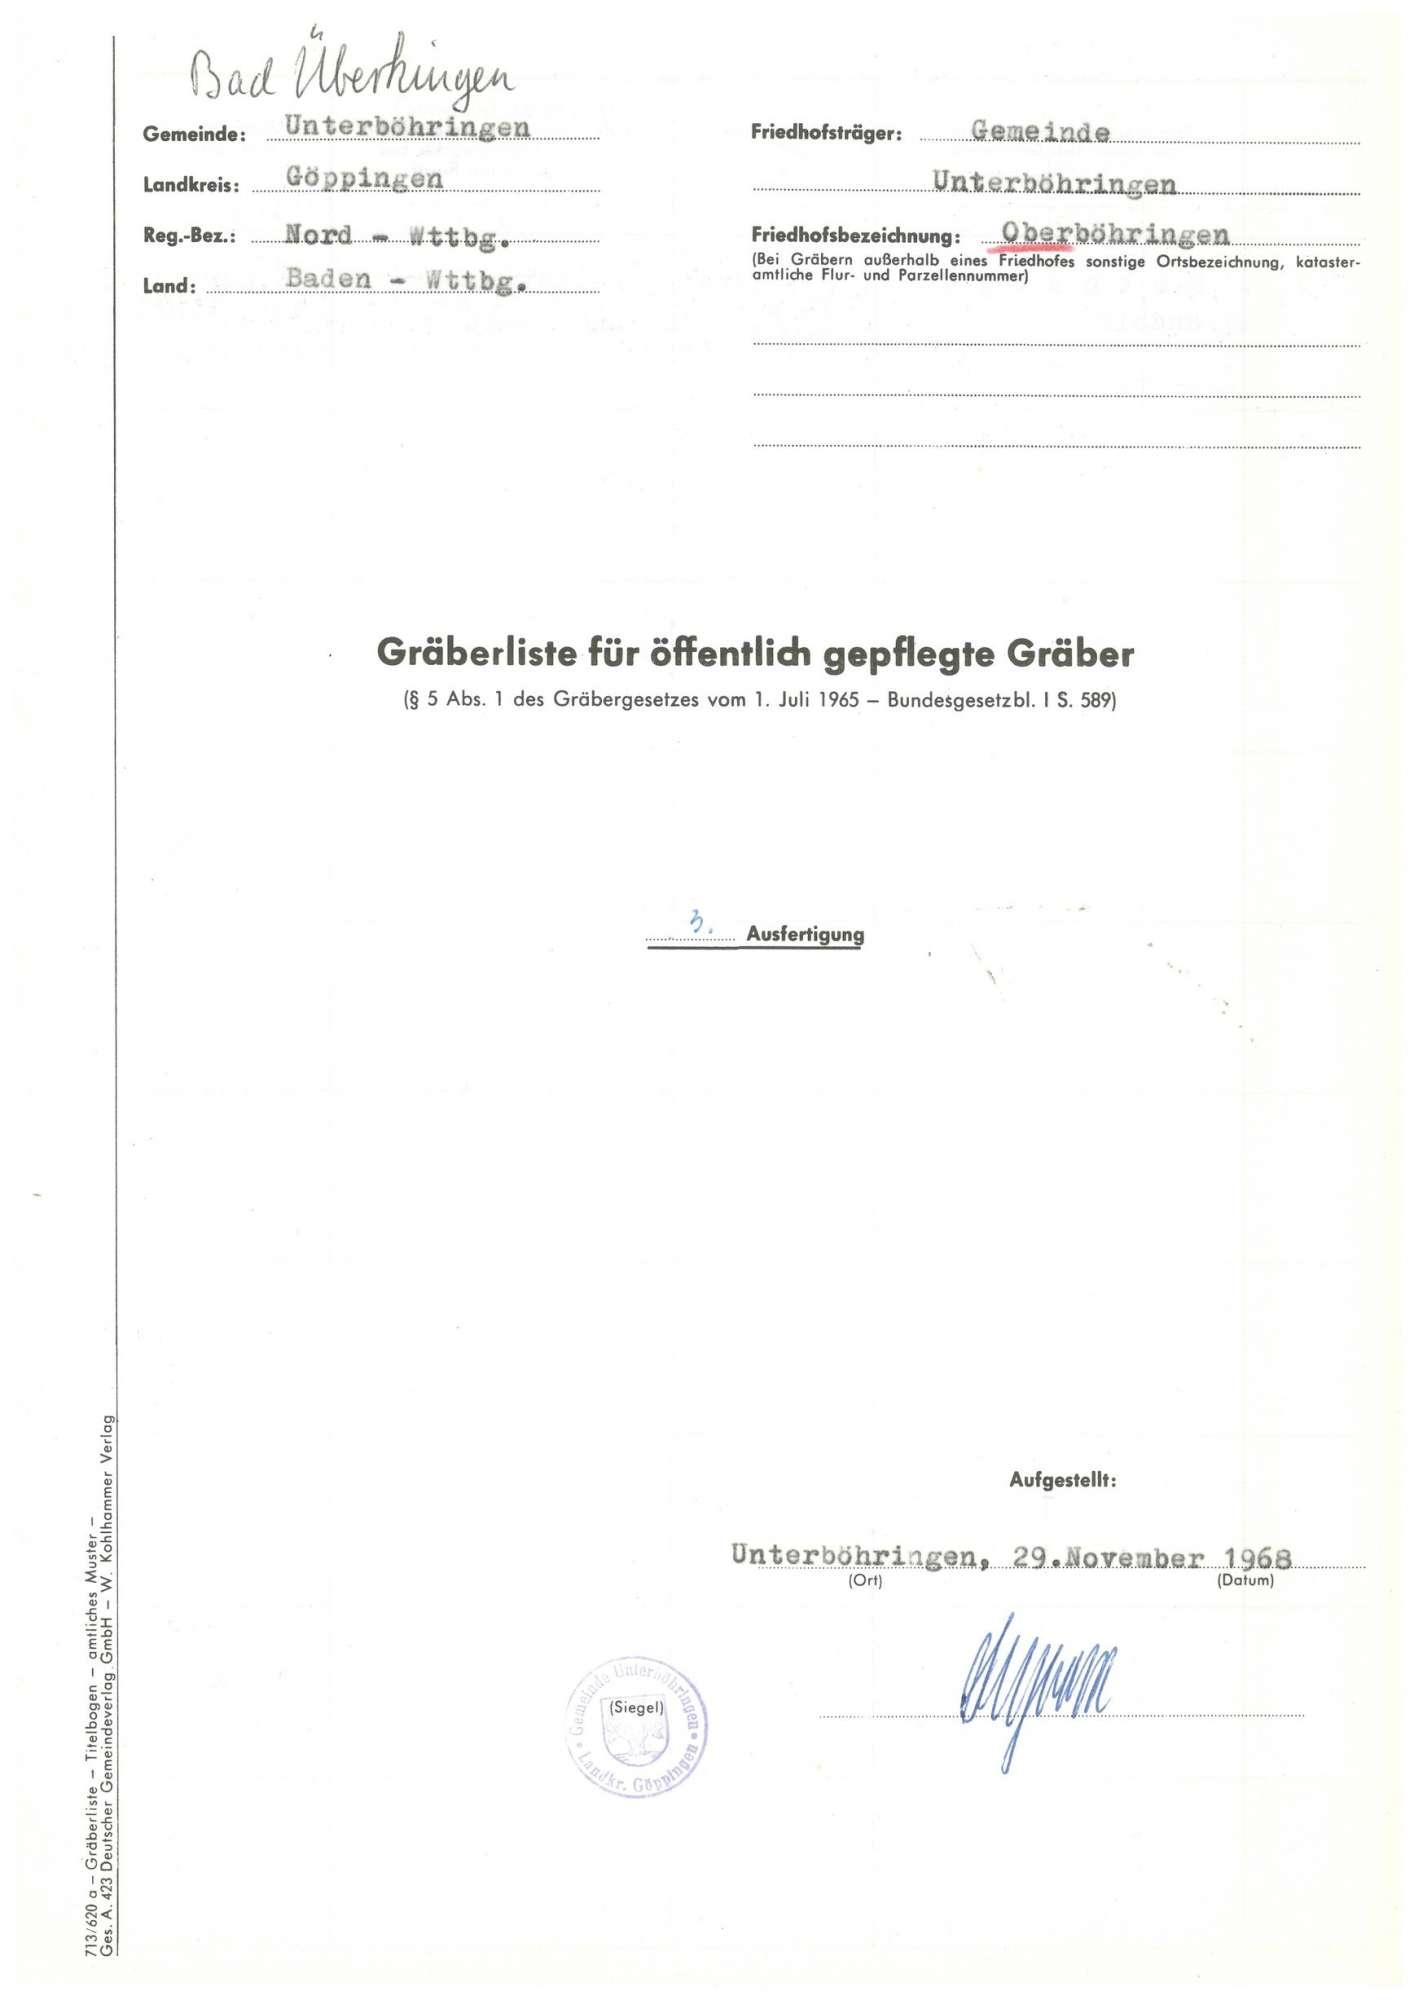 Oberböhringen, Bild 1